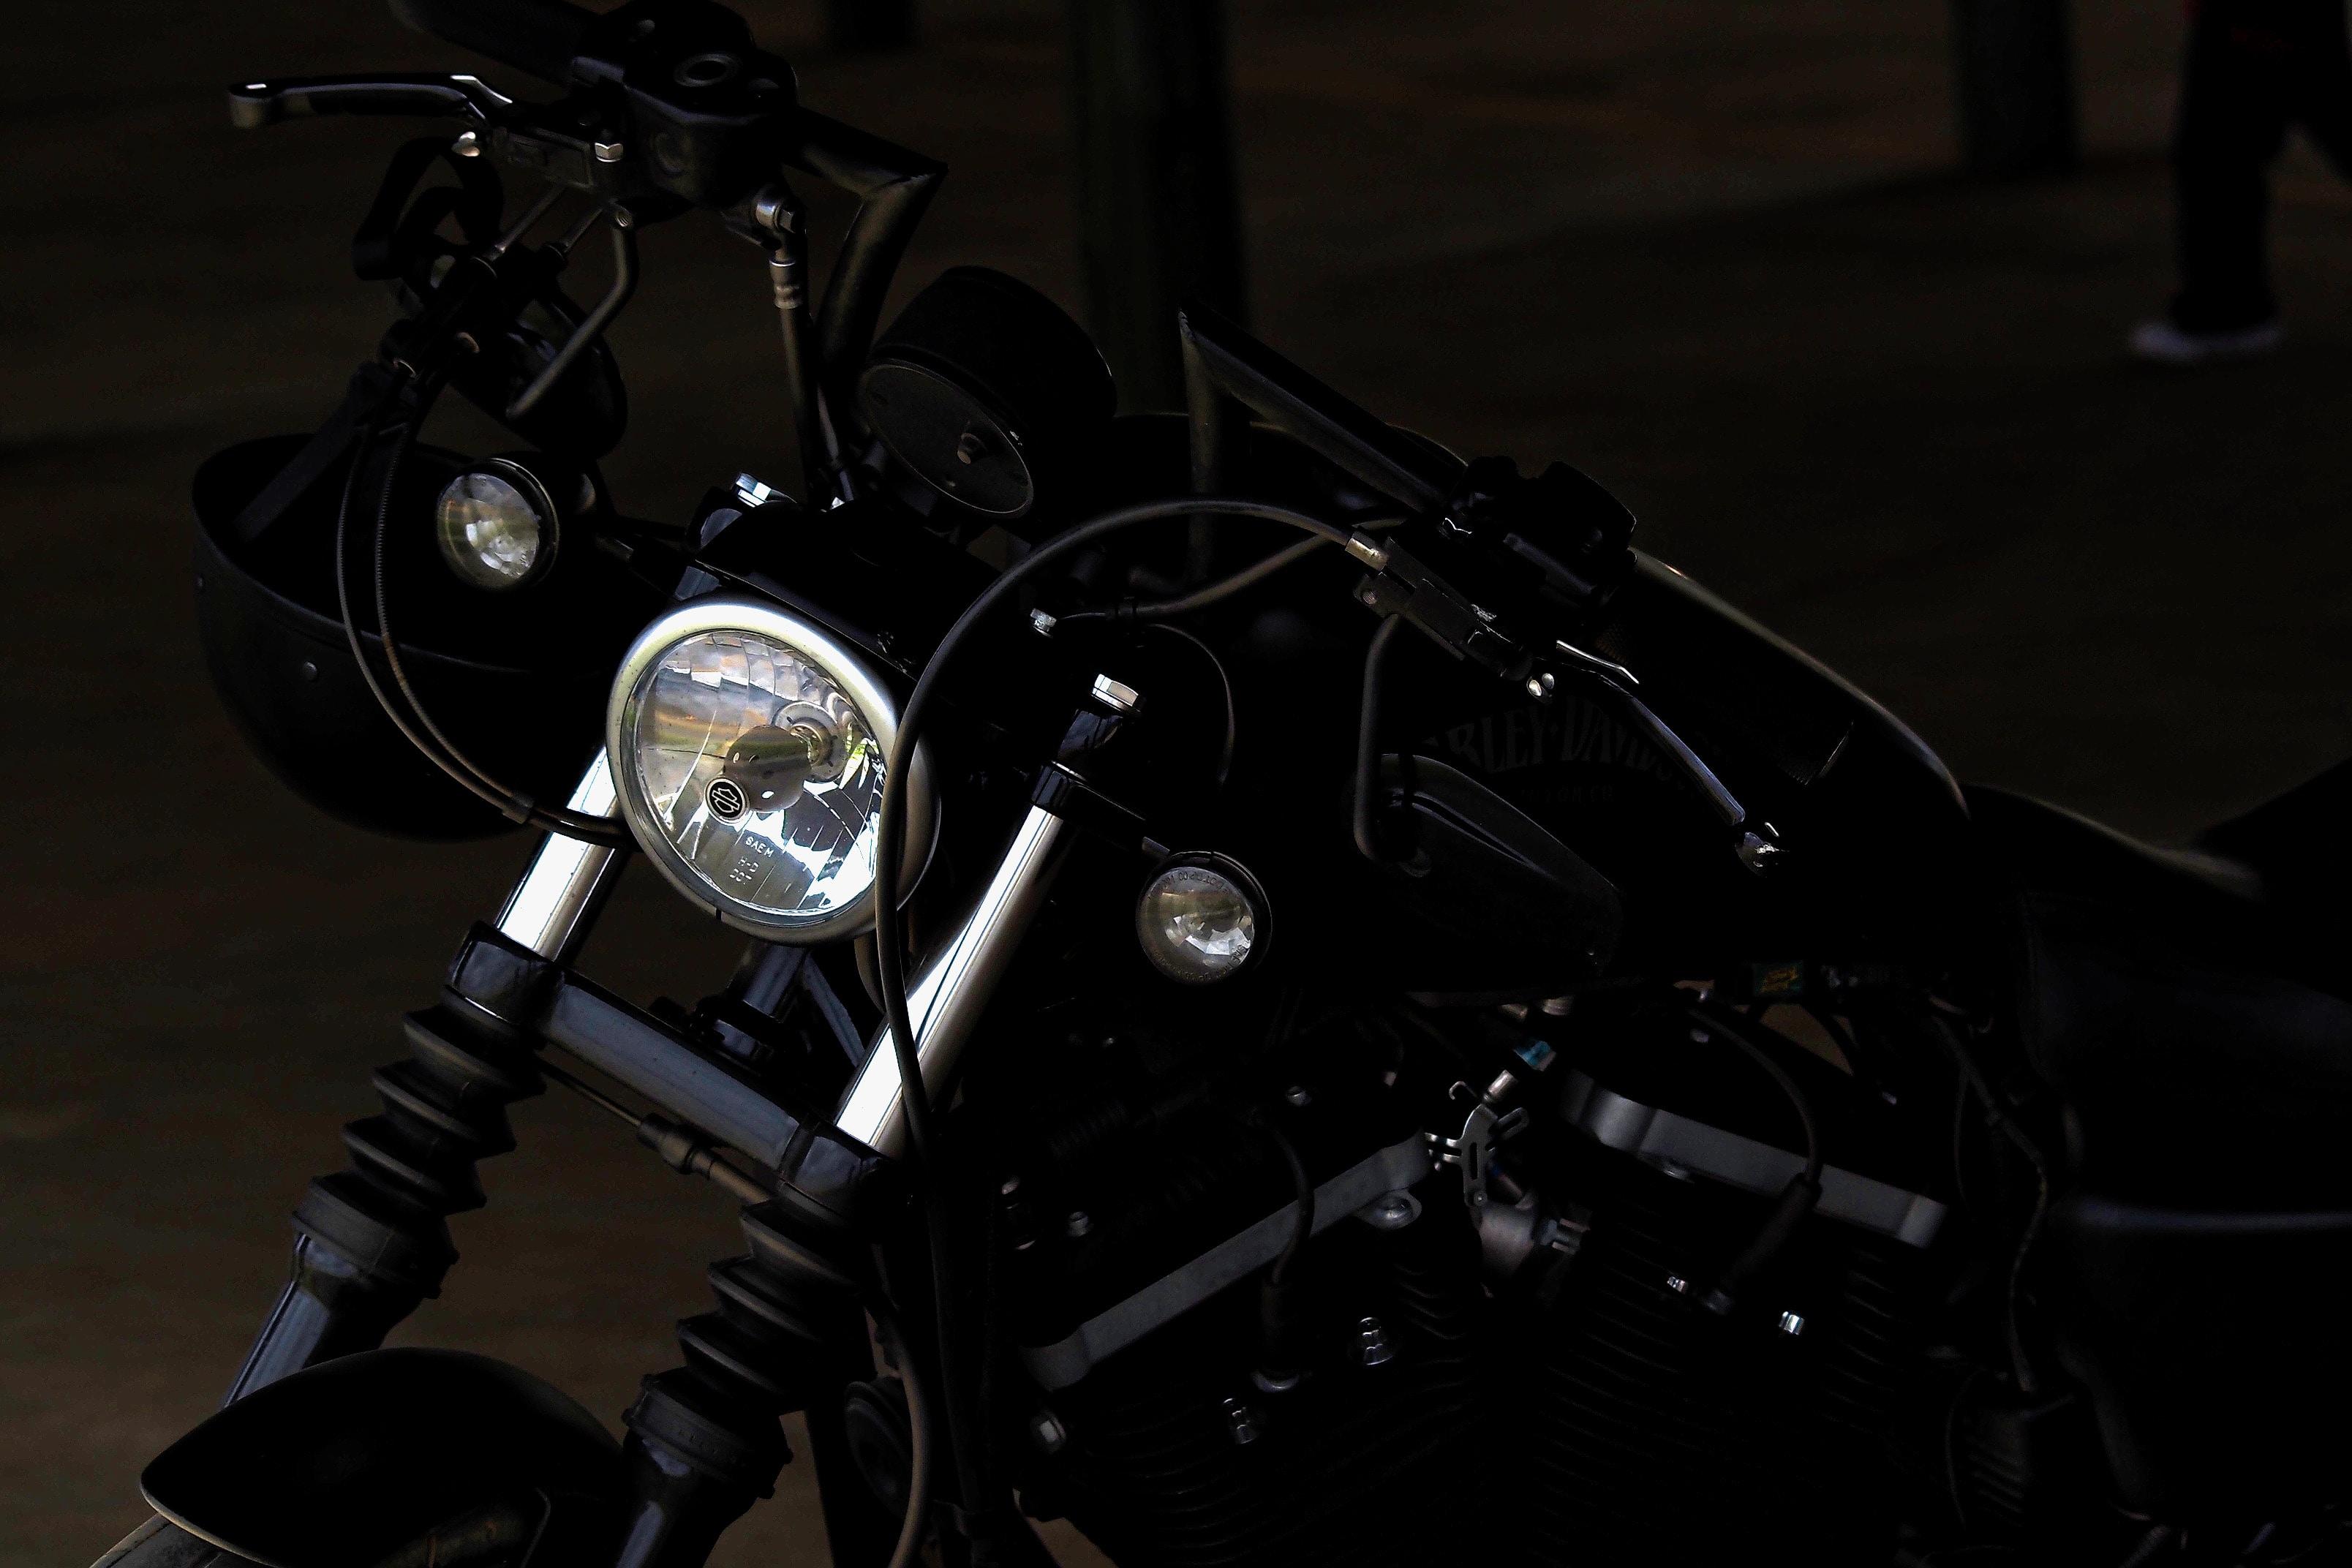 Black motorbike parked in a dark lot